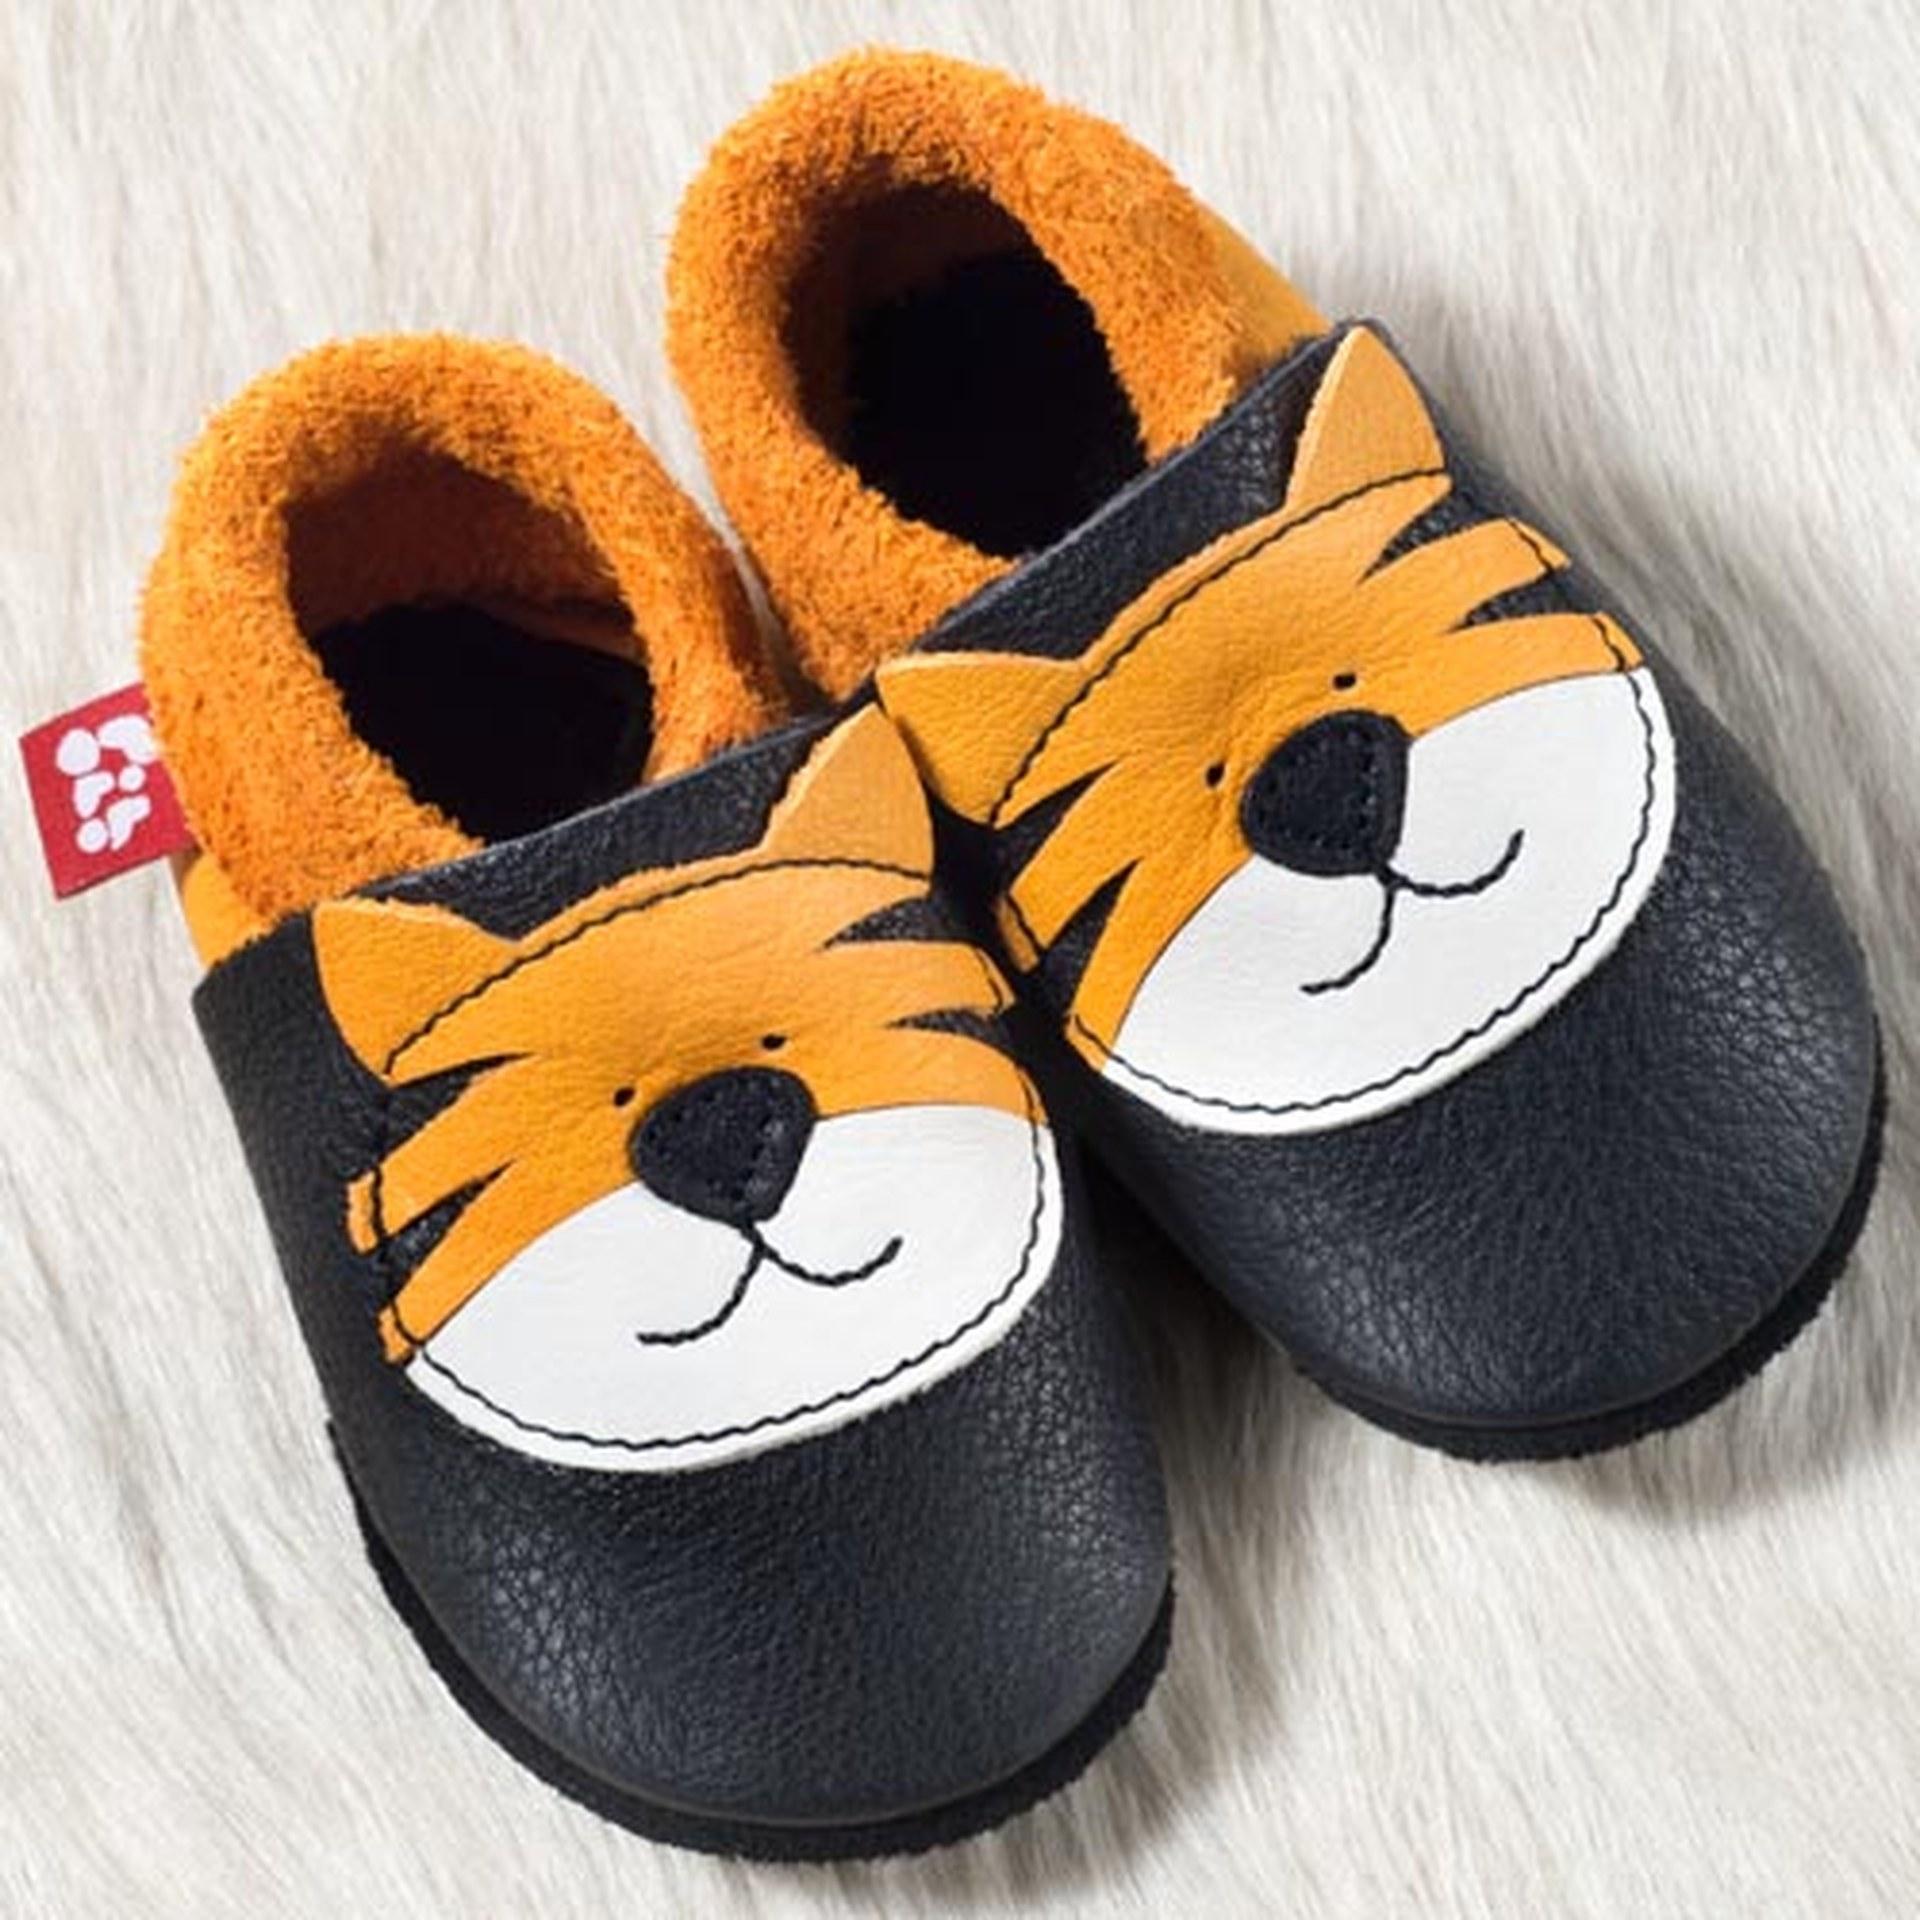 Schuhe 20/21 Tiger Tom - Pololo